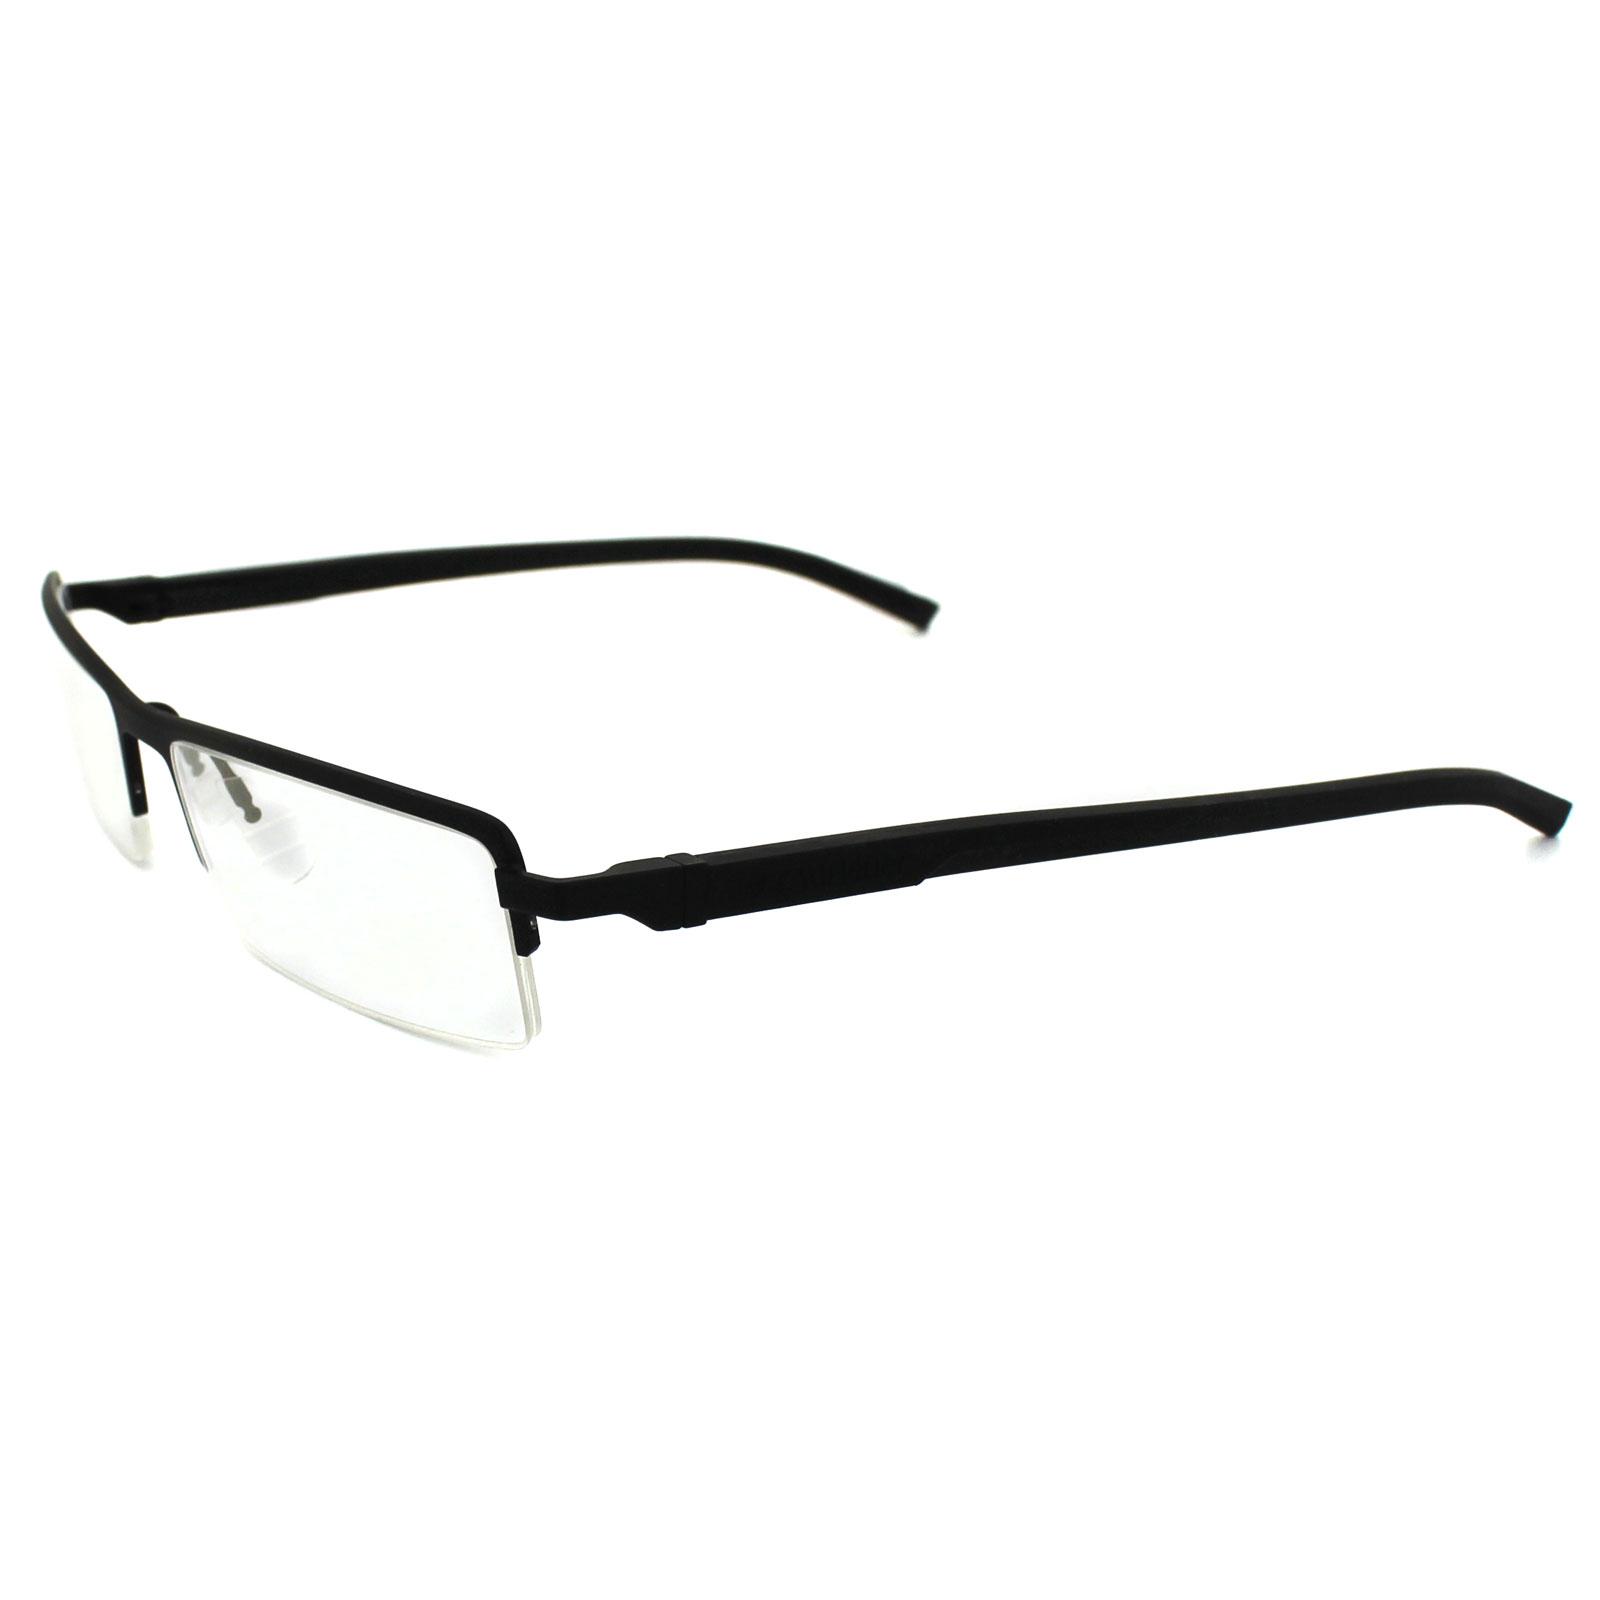 Tag heuer eyeglasses frames uk - Tag Heuer Automatic 0822 Frames